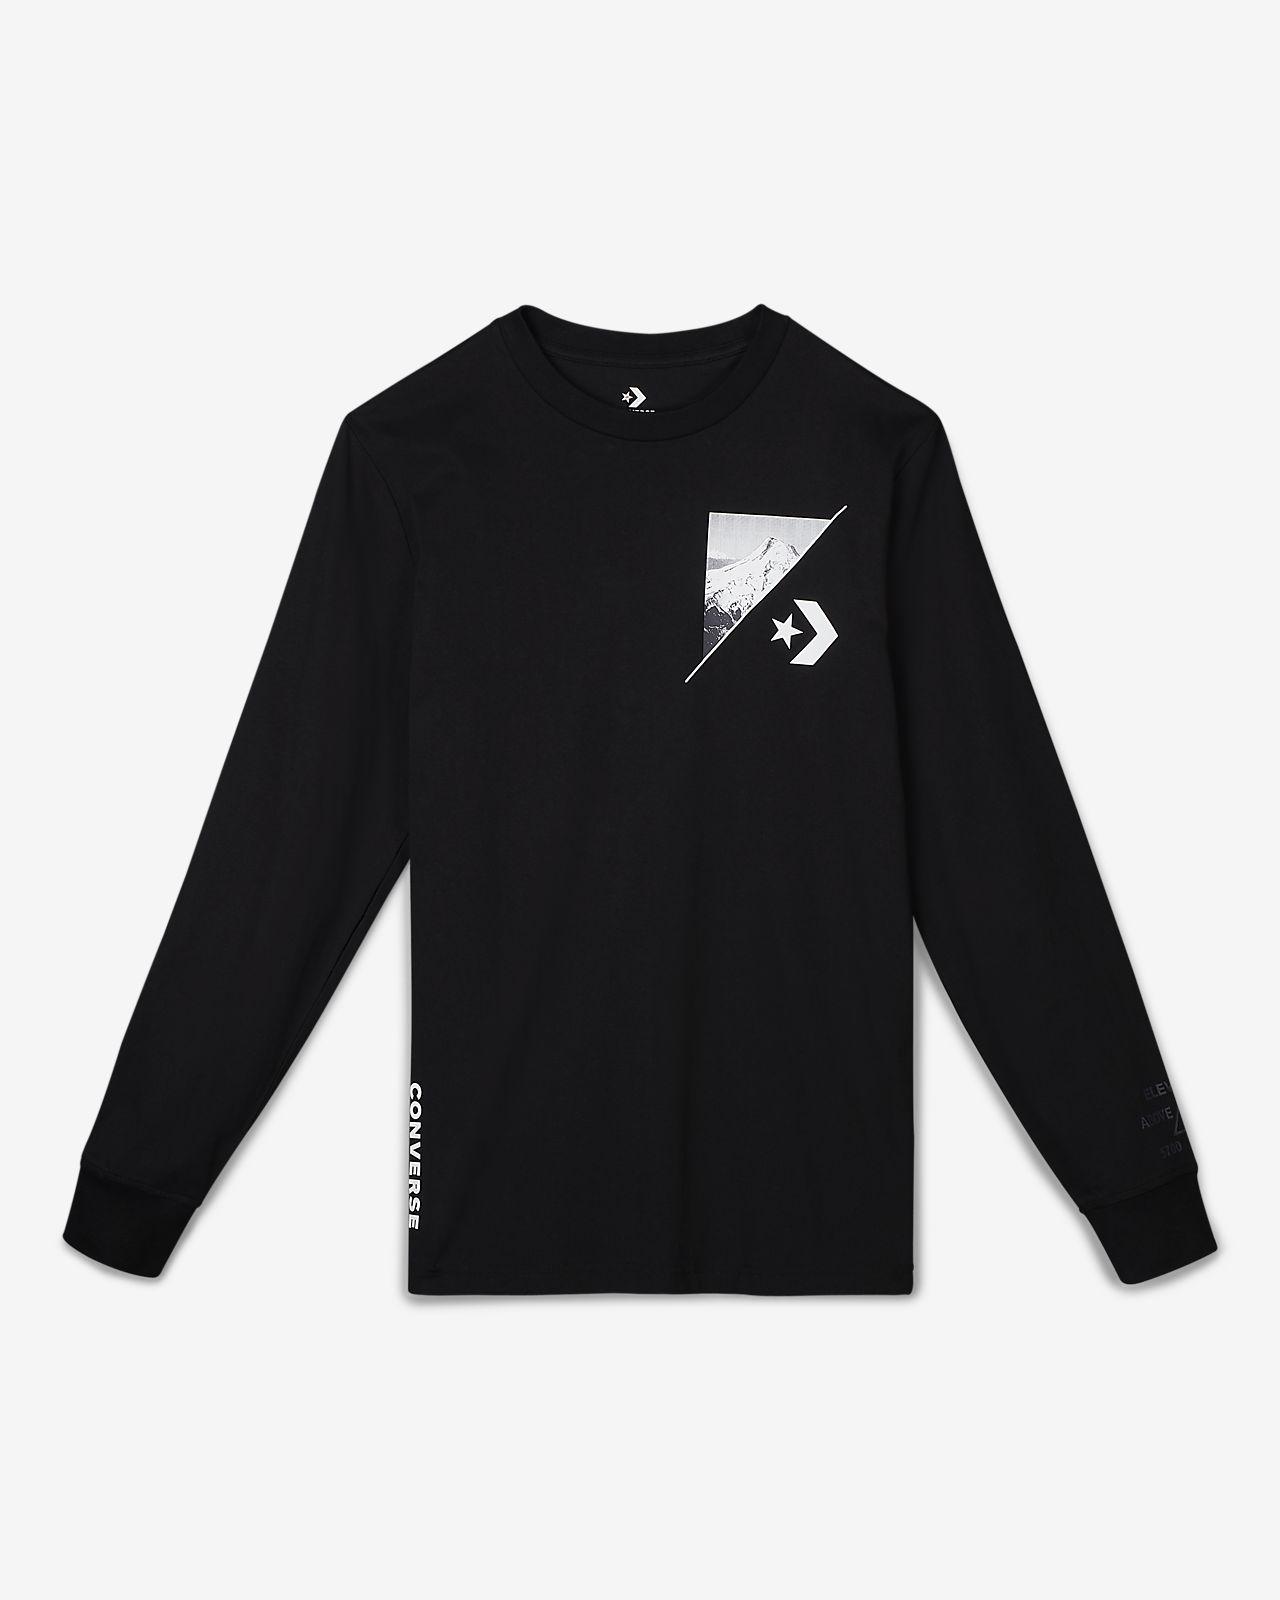 Converse Mountain Club  Men's Long-Sleeve T-Shirt